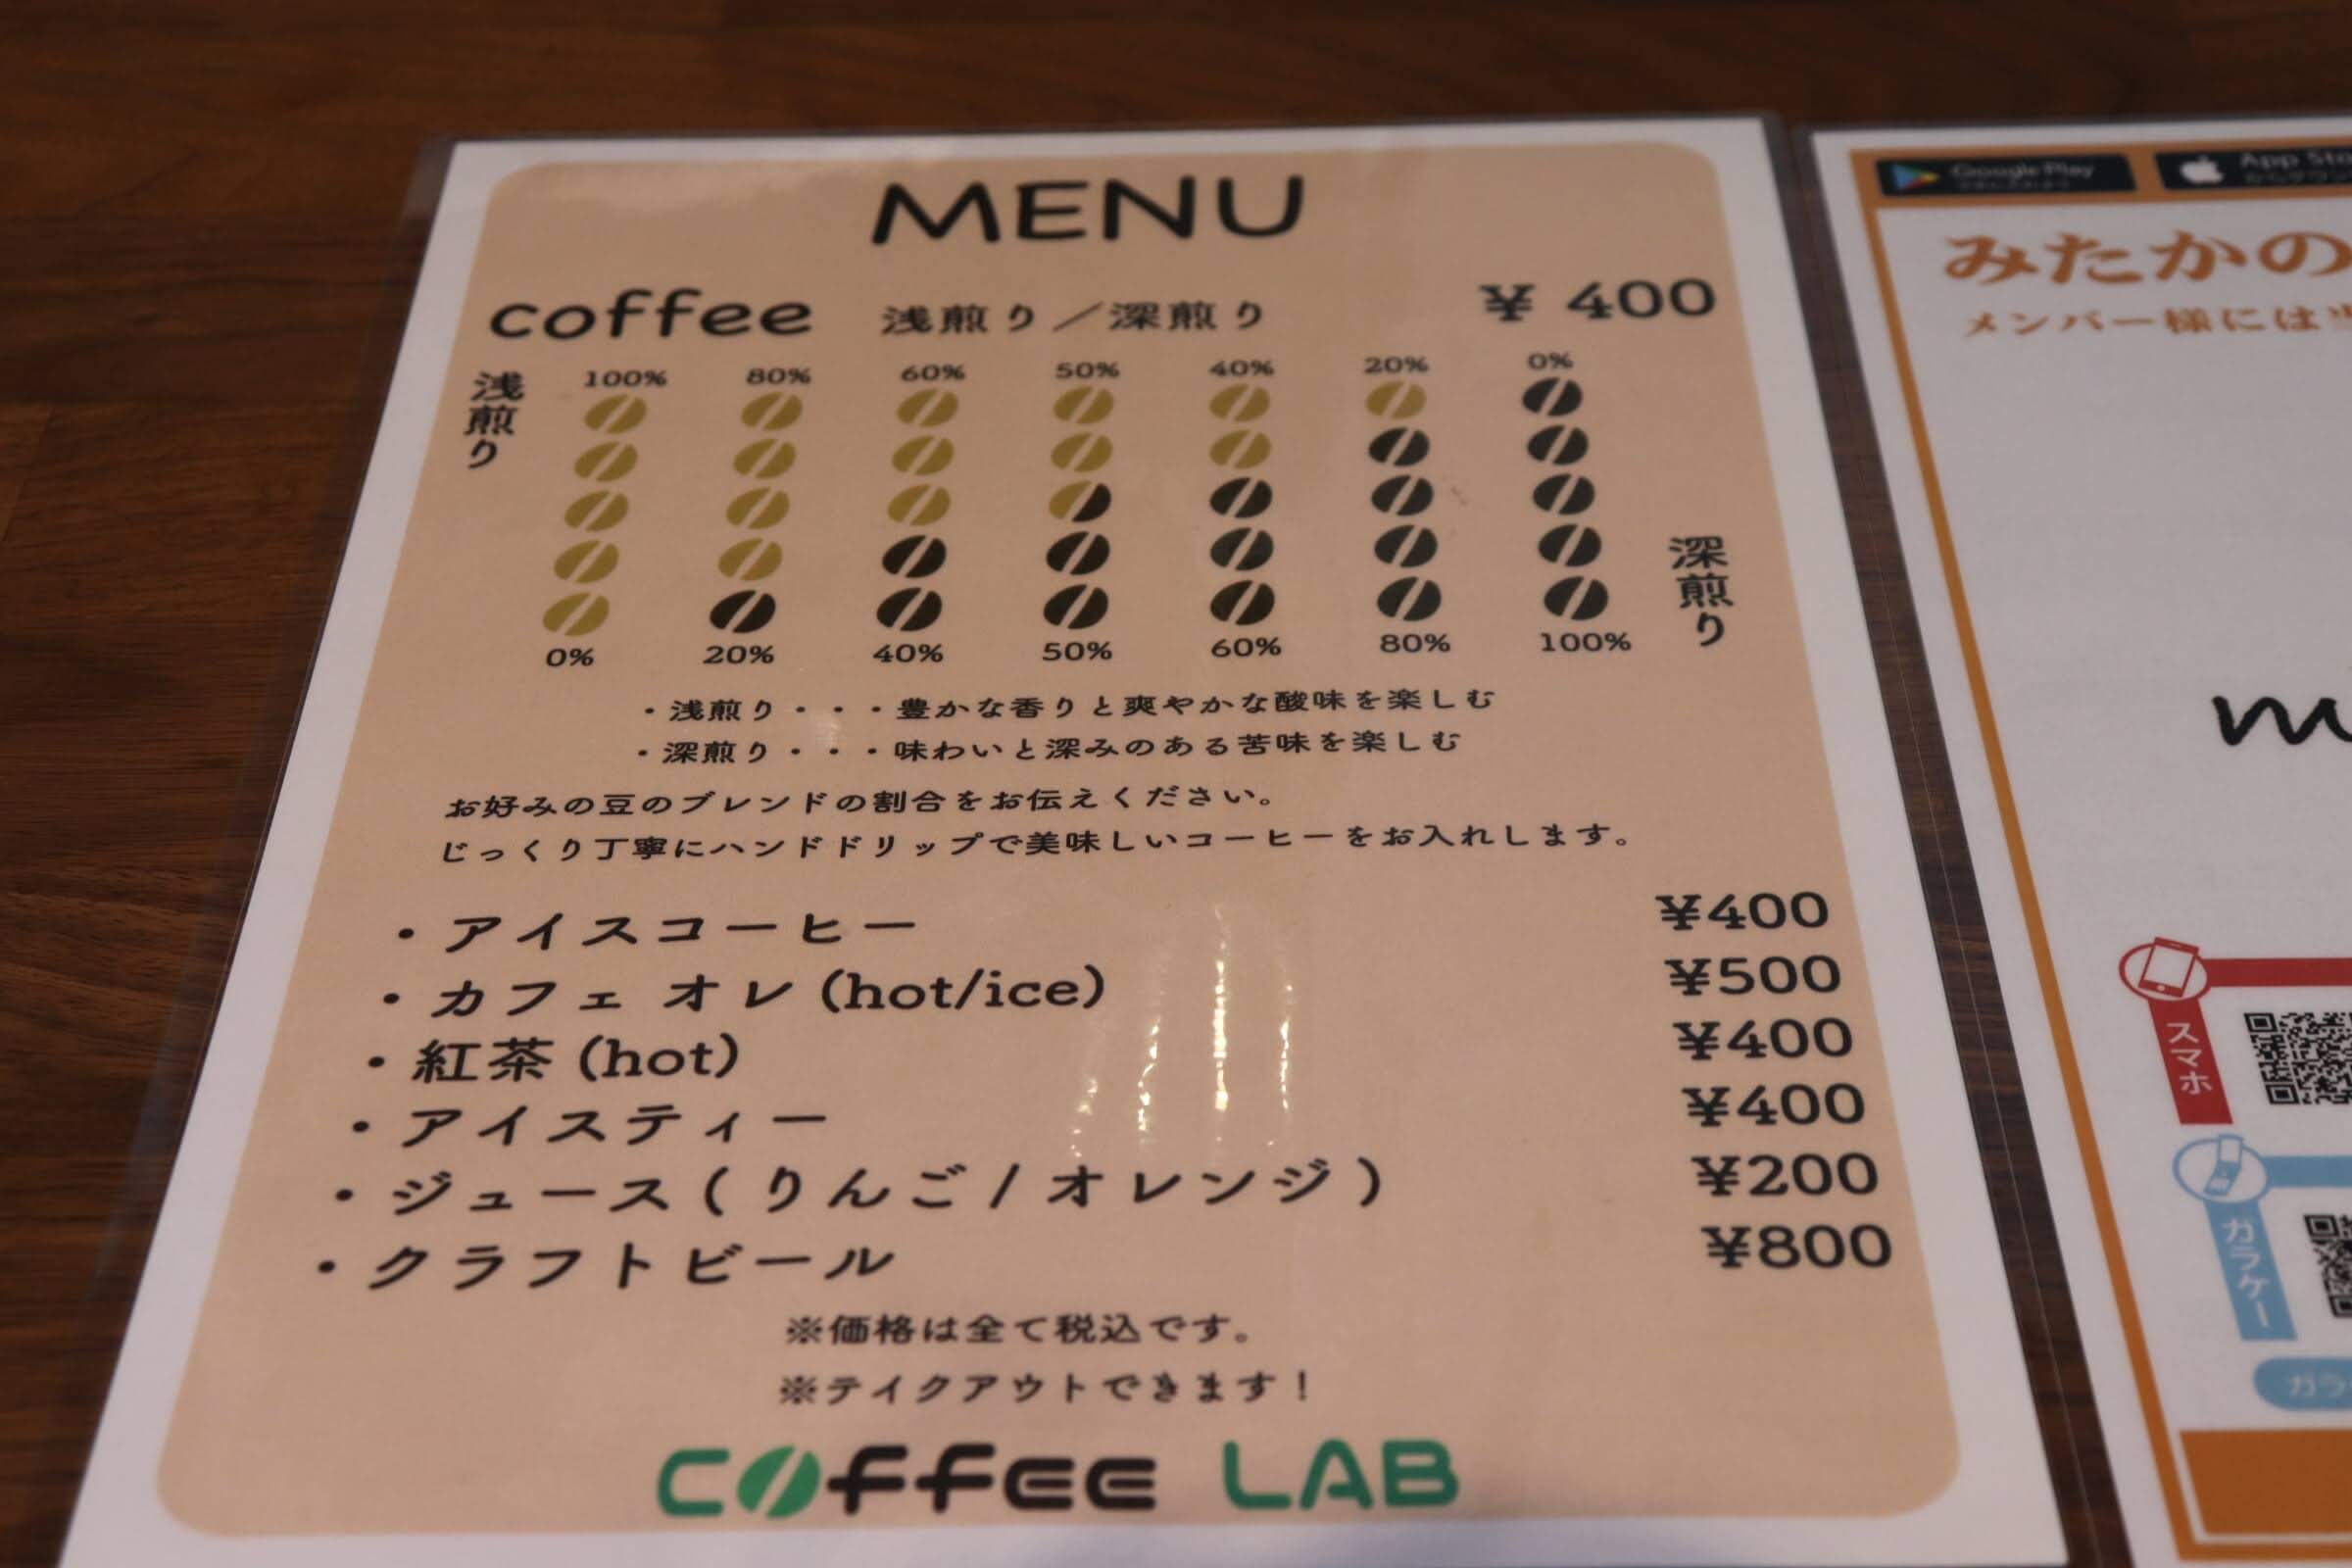 mitakanaovaのコーヒーメニュー表